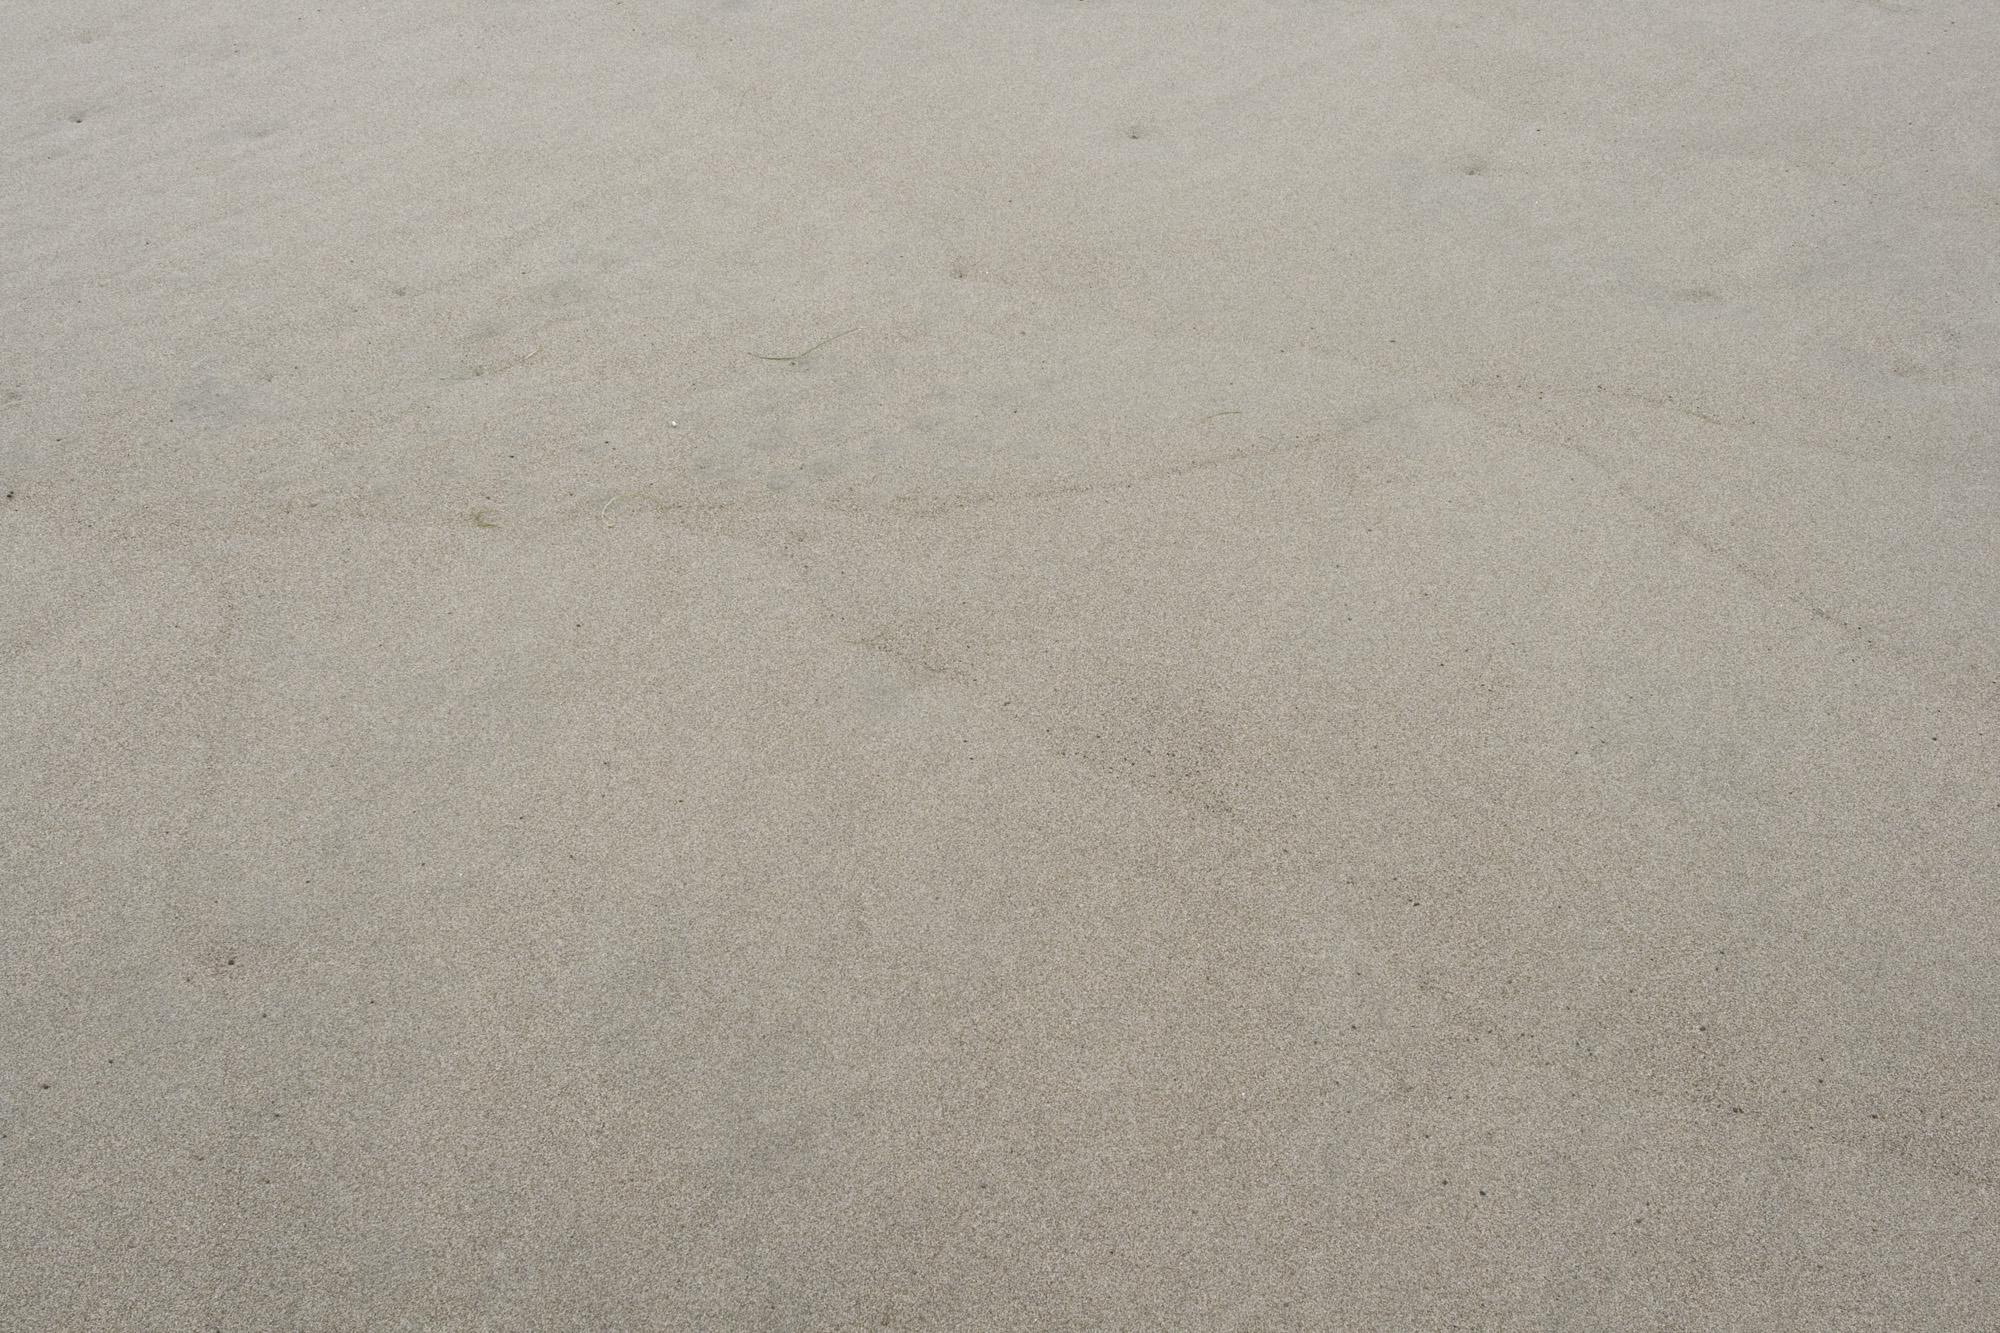 Ocean Shores beach sand texture